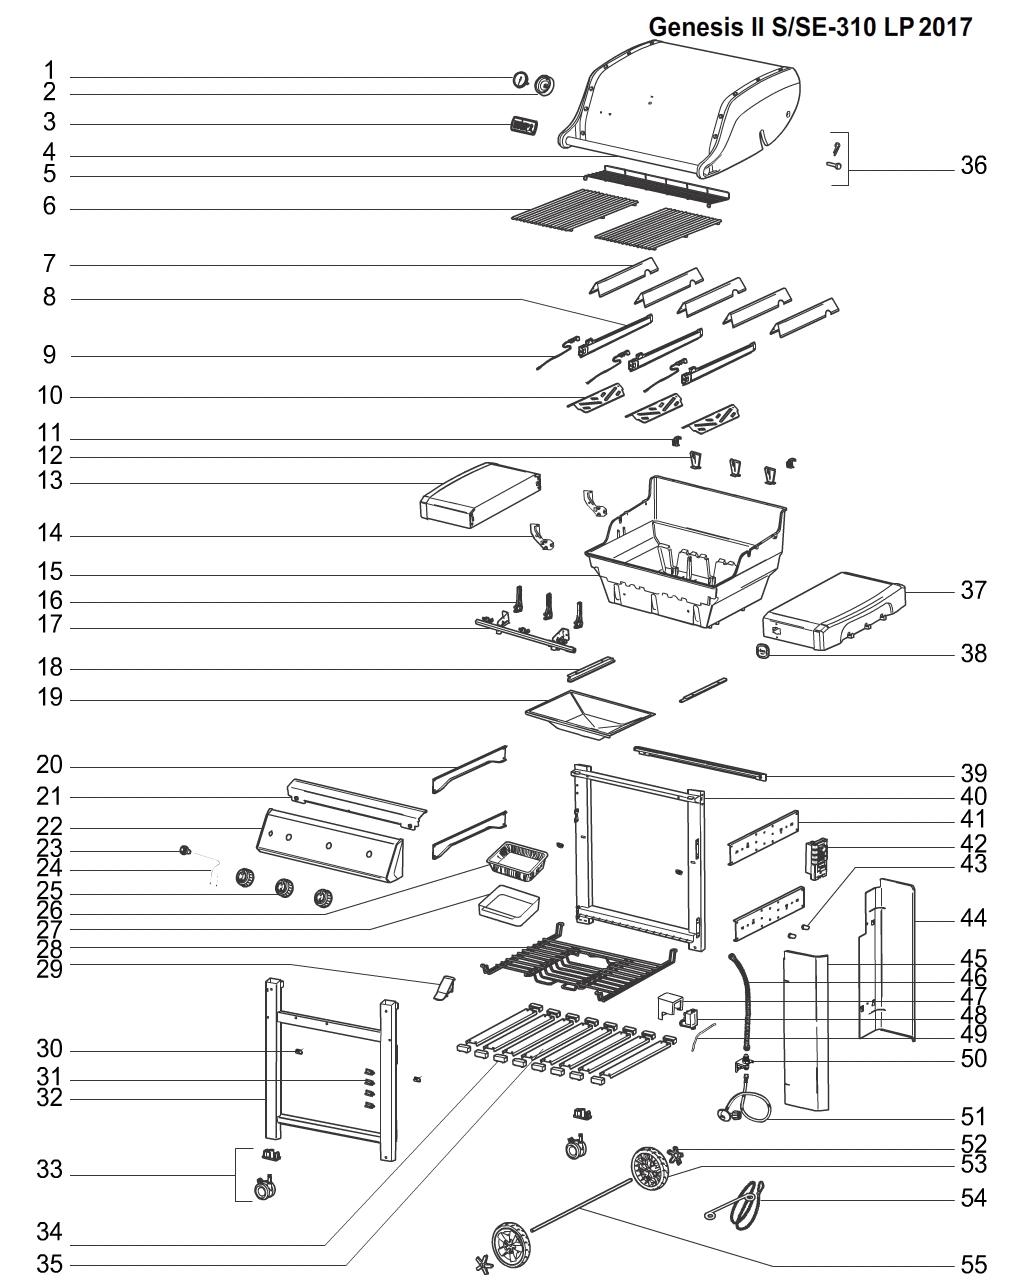 [DIAGRAM_4PO]  Weber Wiring Diagrams - Marine Light Wiring Diagram -  volvos80.nescafe.jeanjaures37.fr   Weber Wiring Diagrams      Wiring Diagram Resource